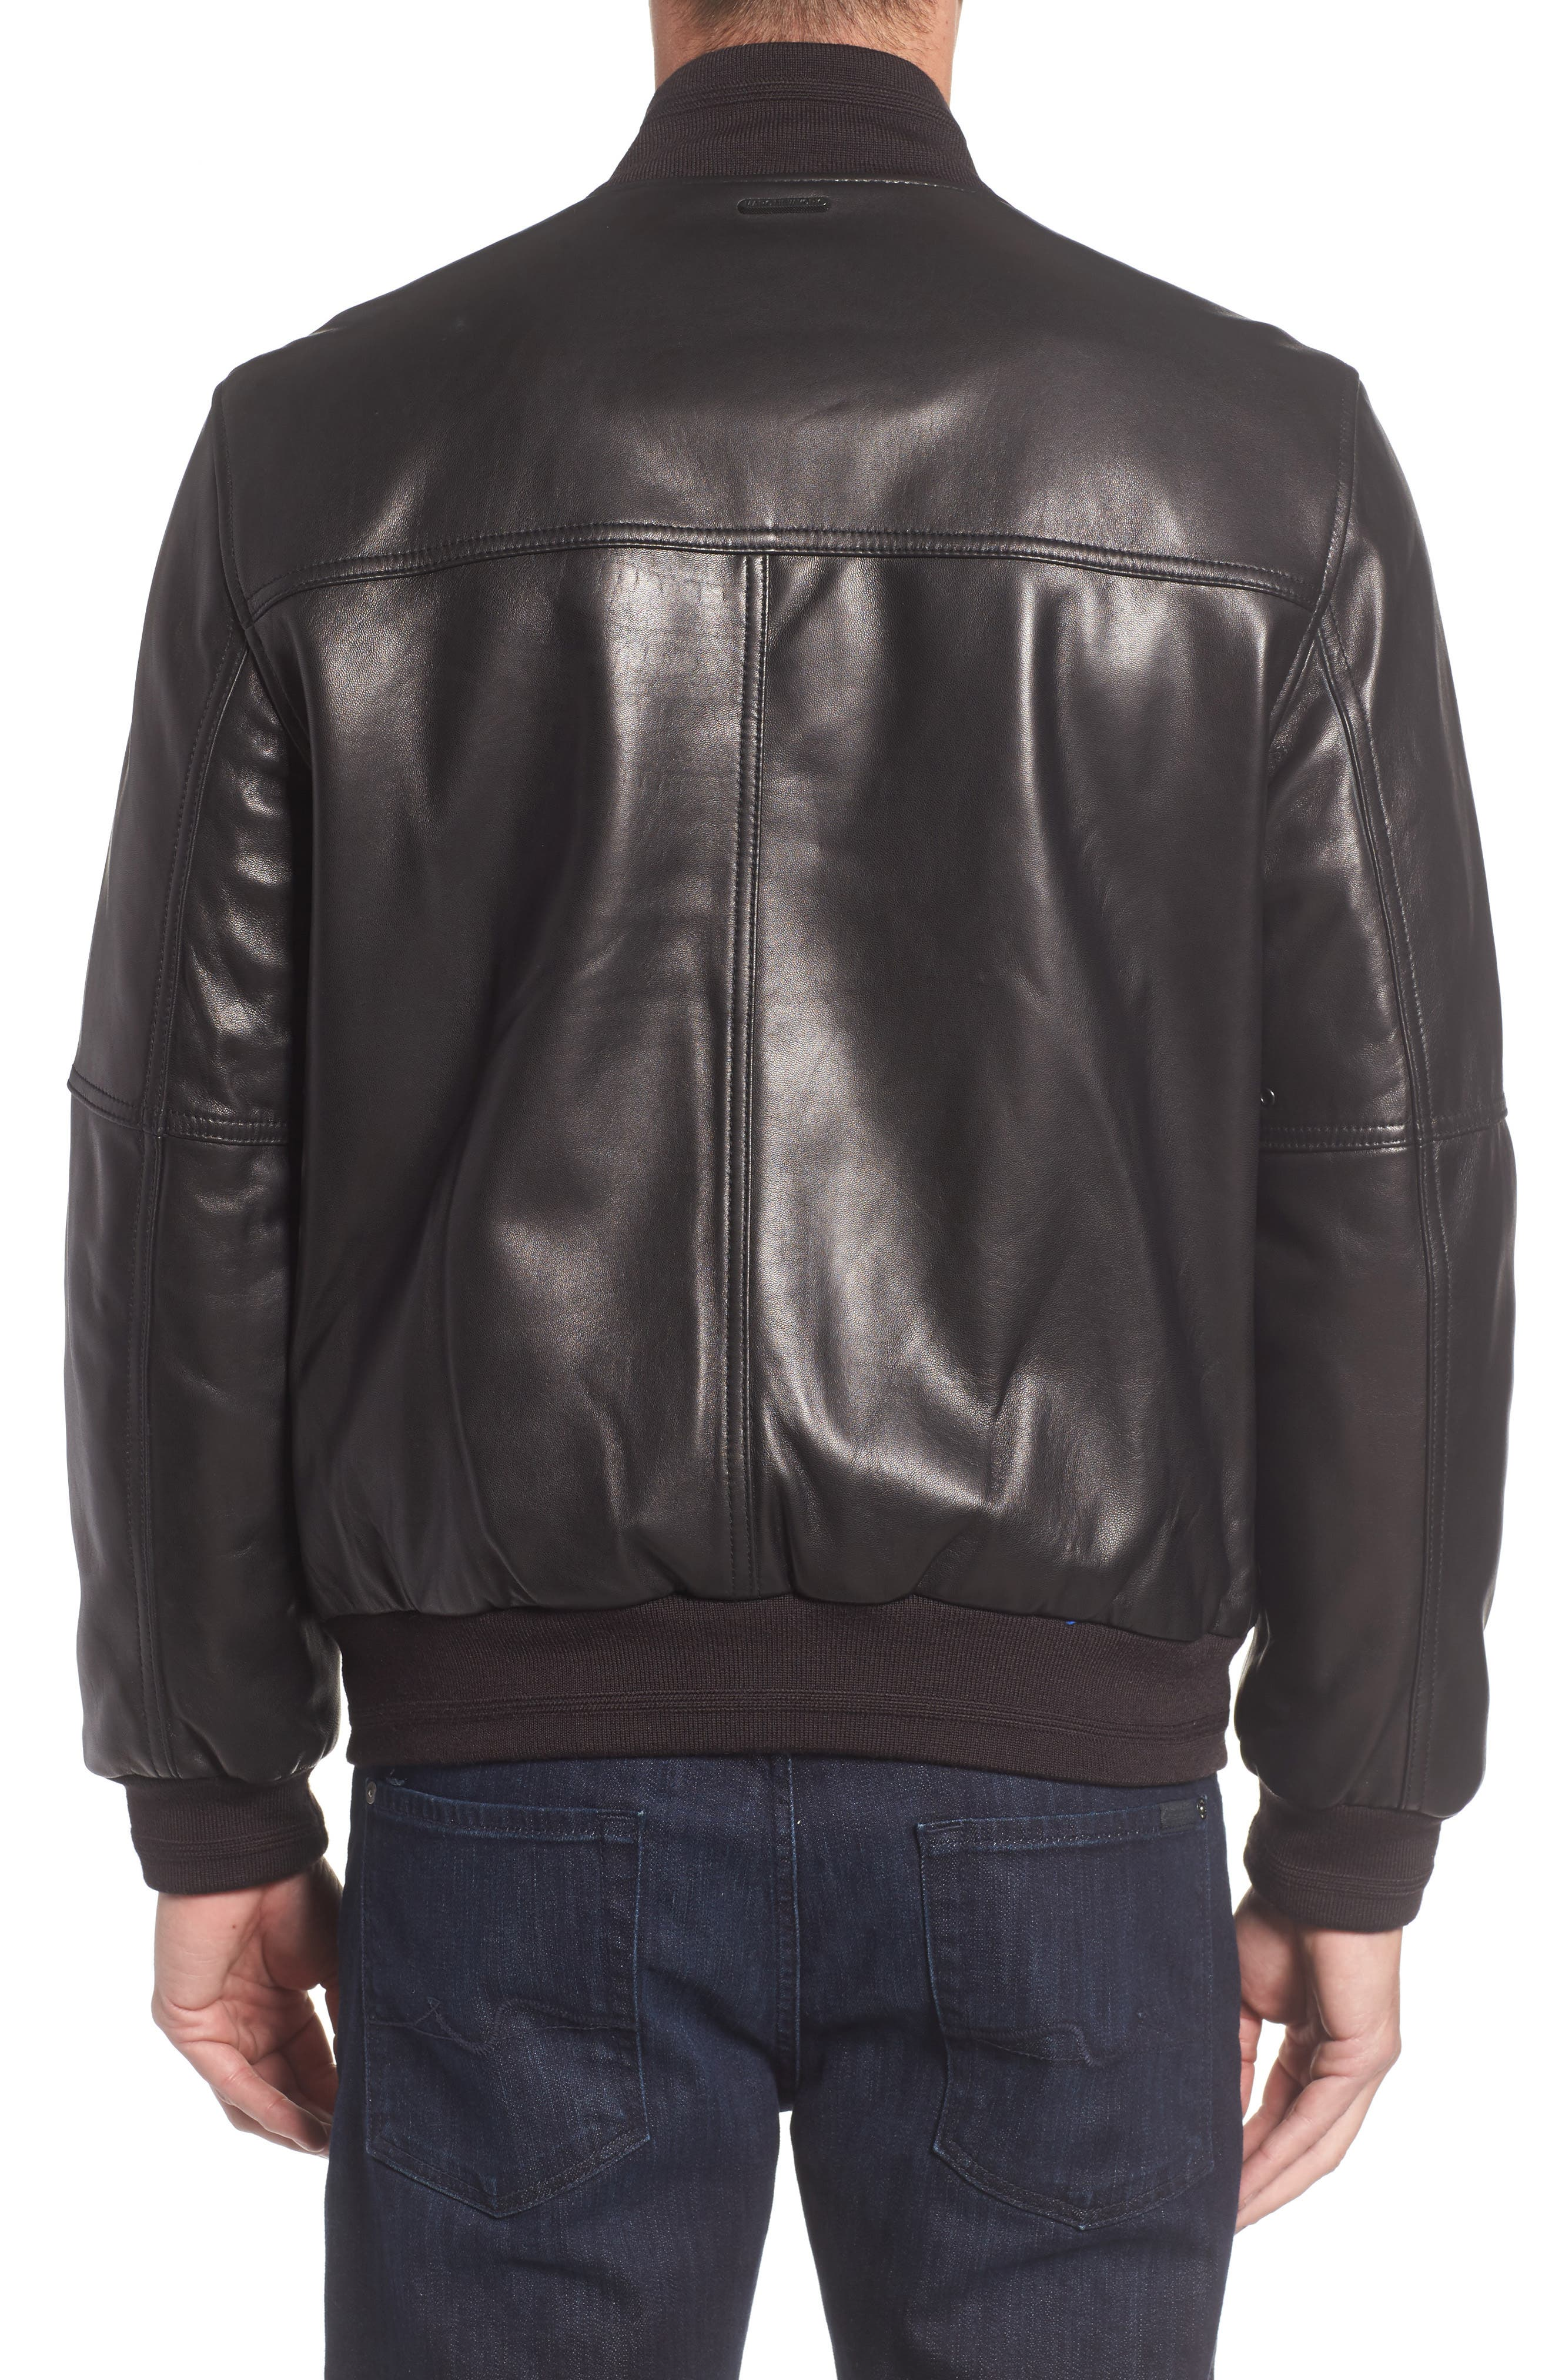 Summit Leather Bomber Jacket,                             Alternate thumbnail 2, color,                             001